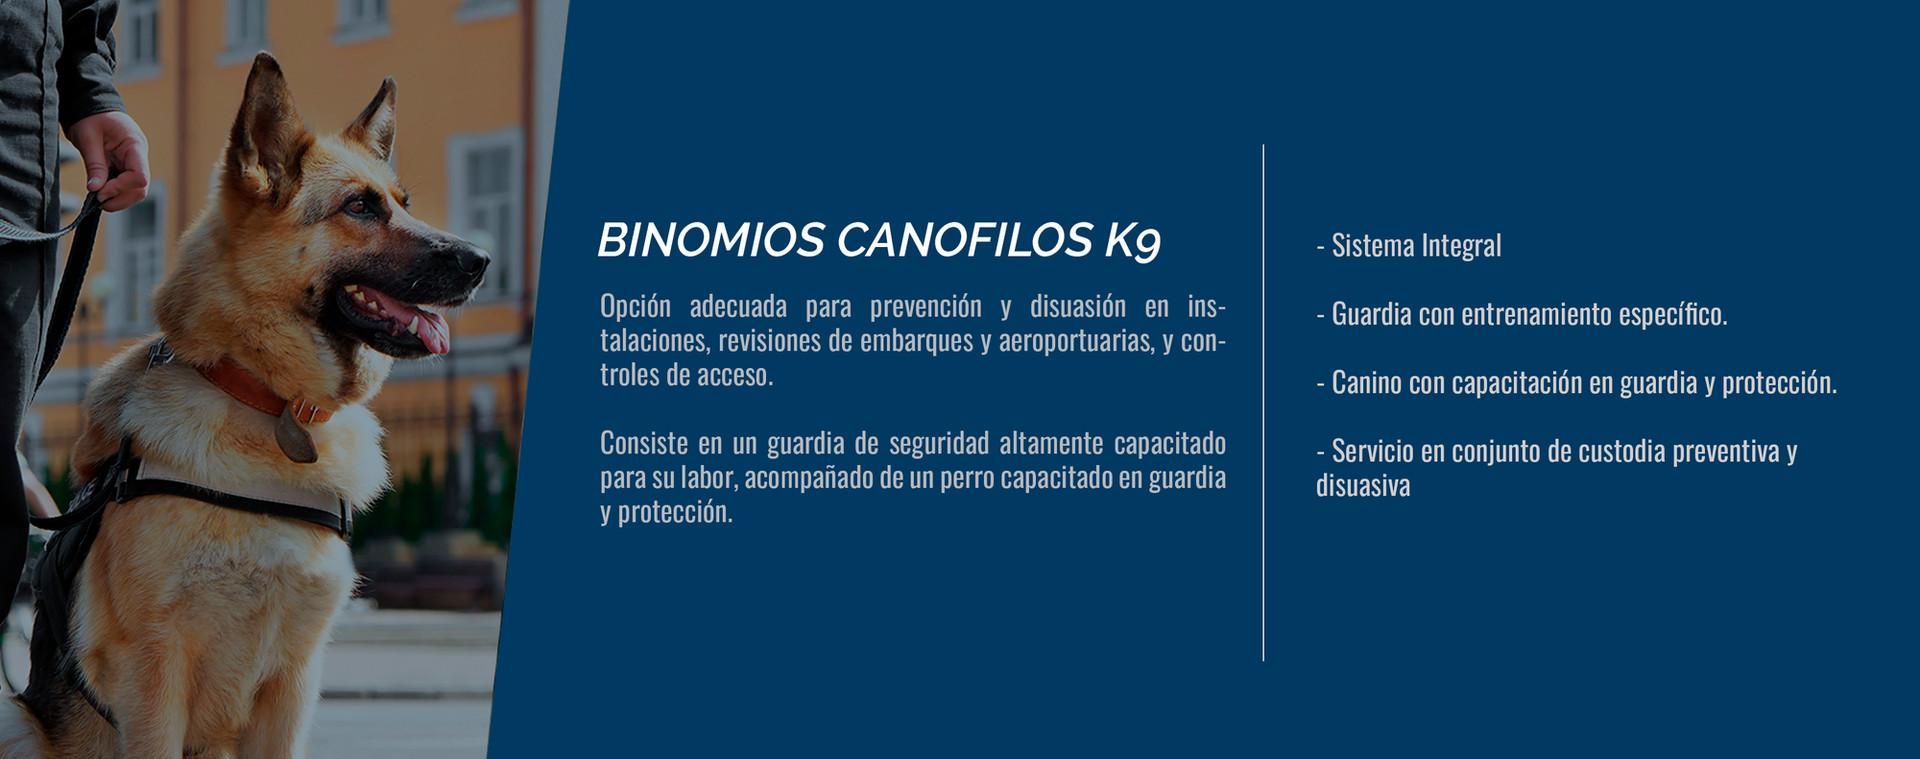 Binomios Canofilos k9